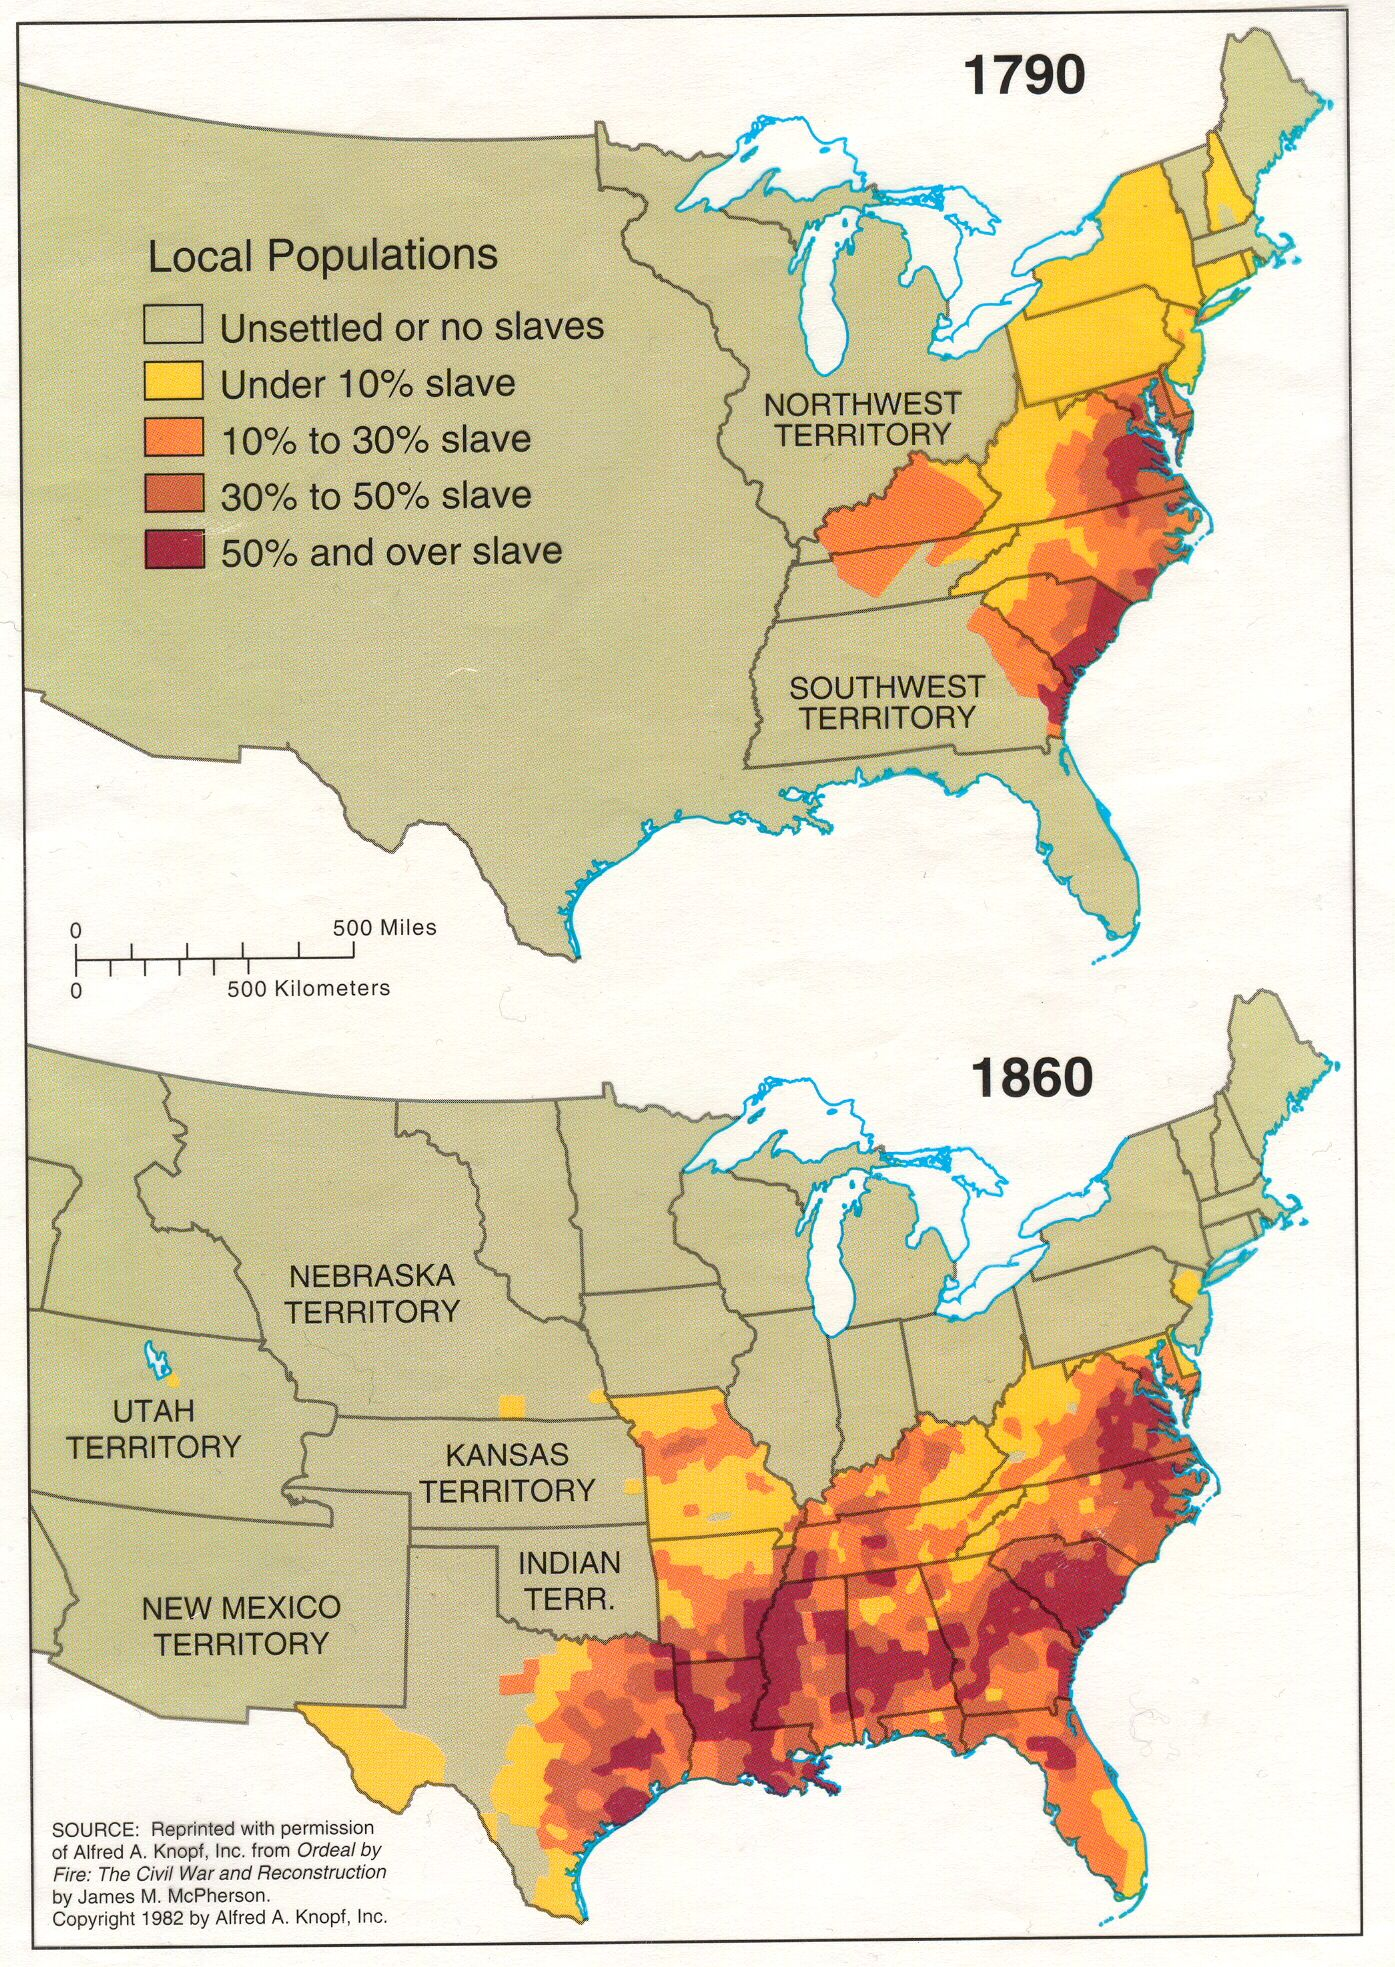 37 Maps That Explain The American Civil War